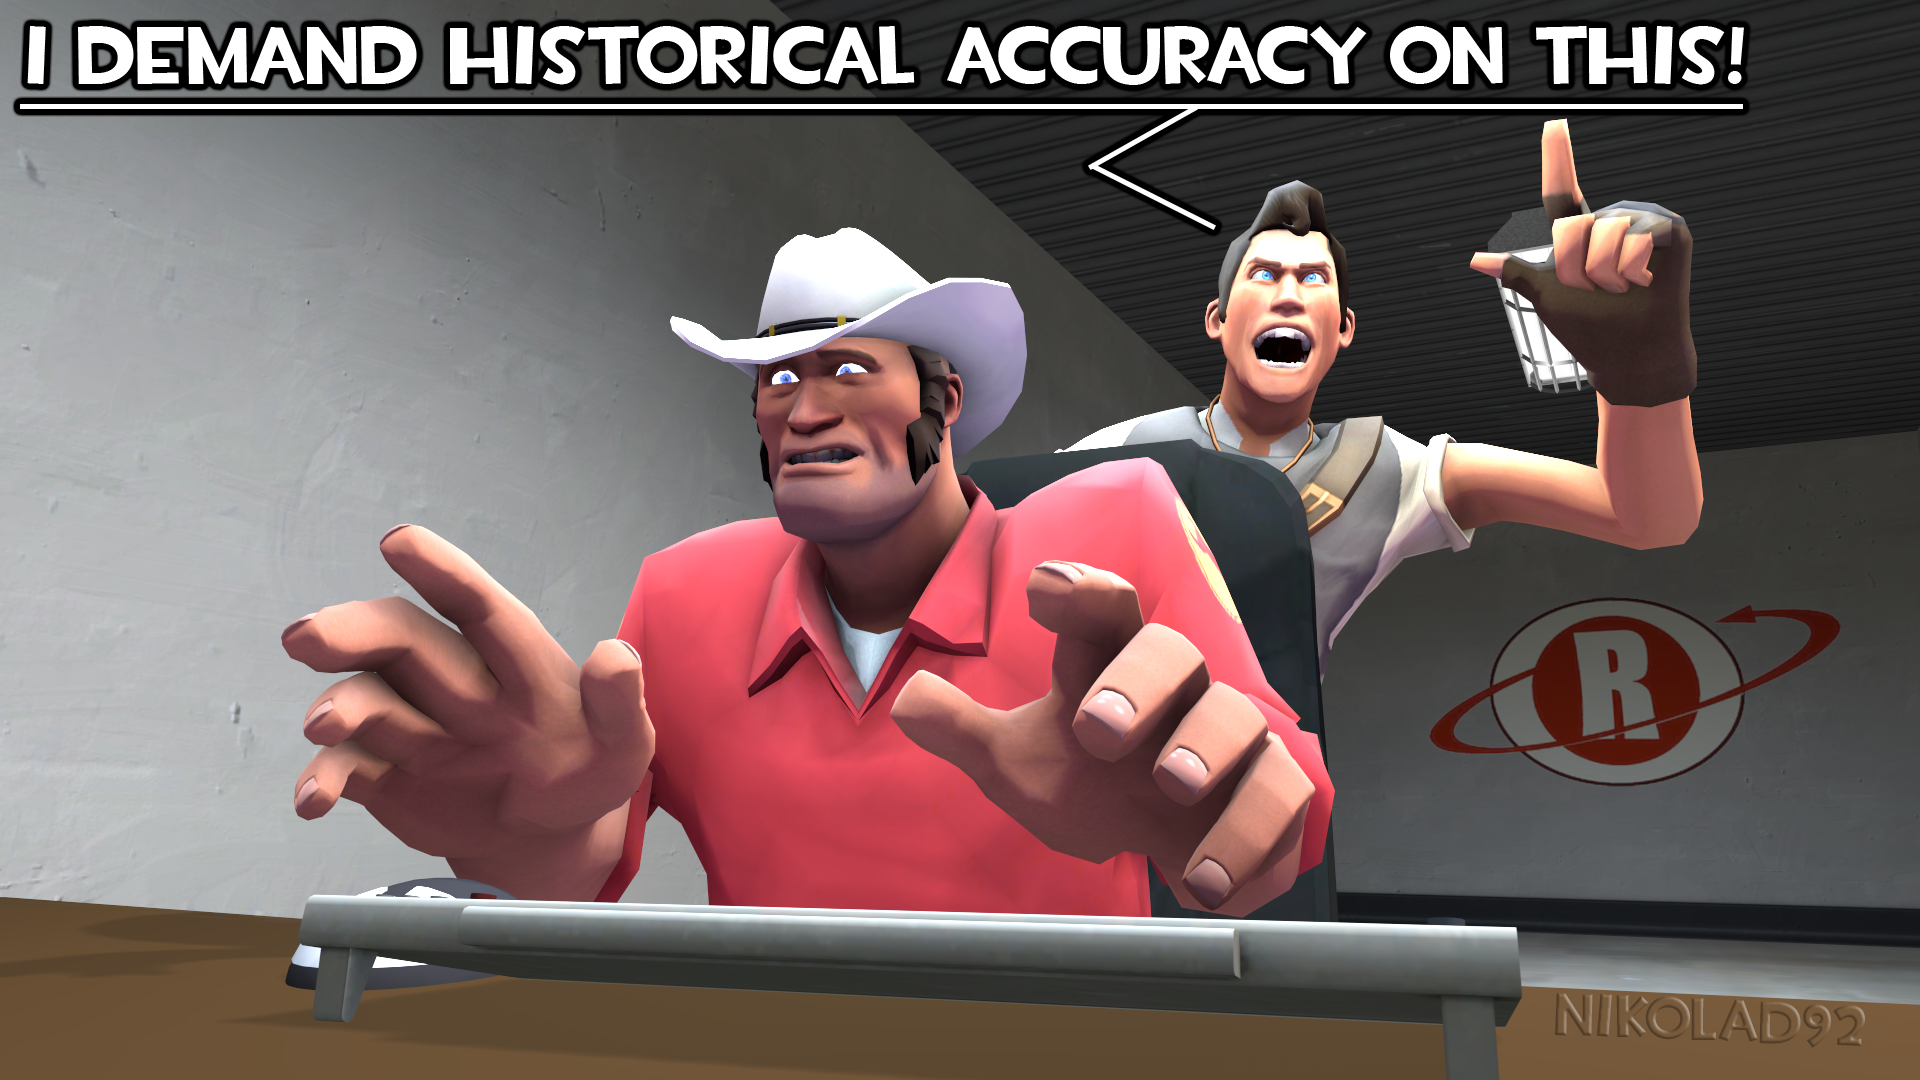 Historical accuracy by Nikolad92